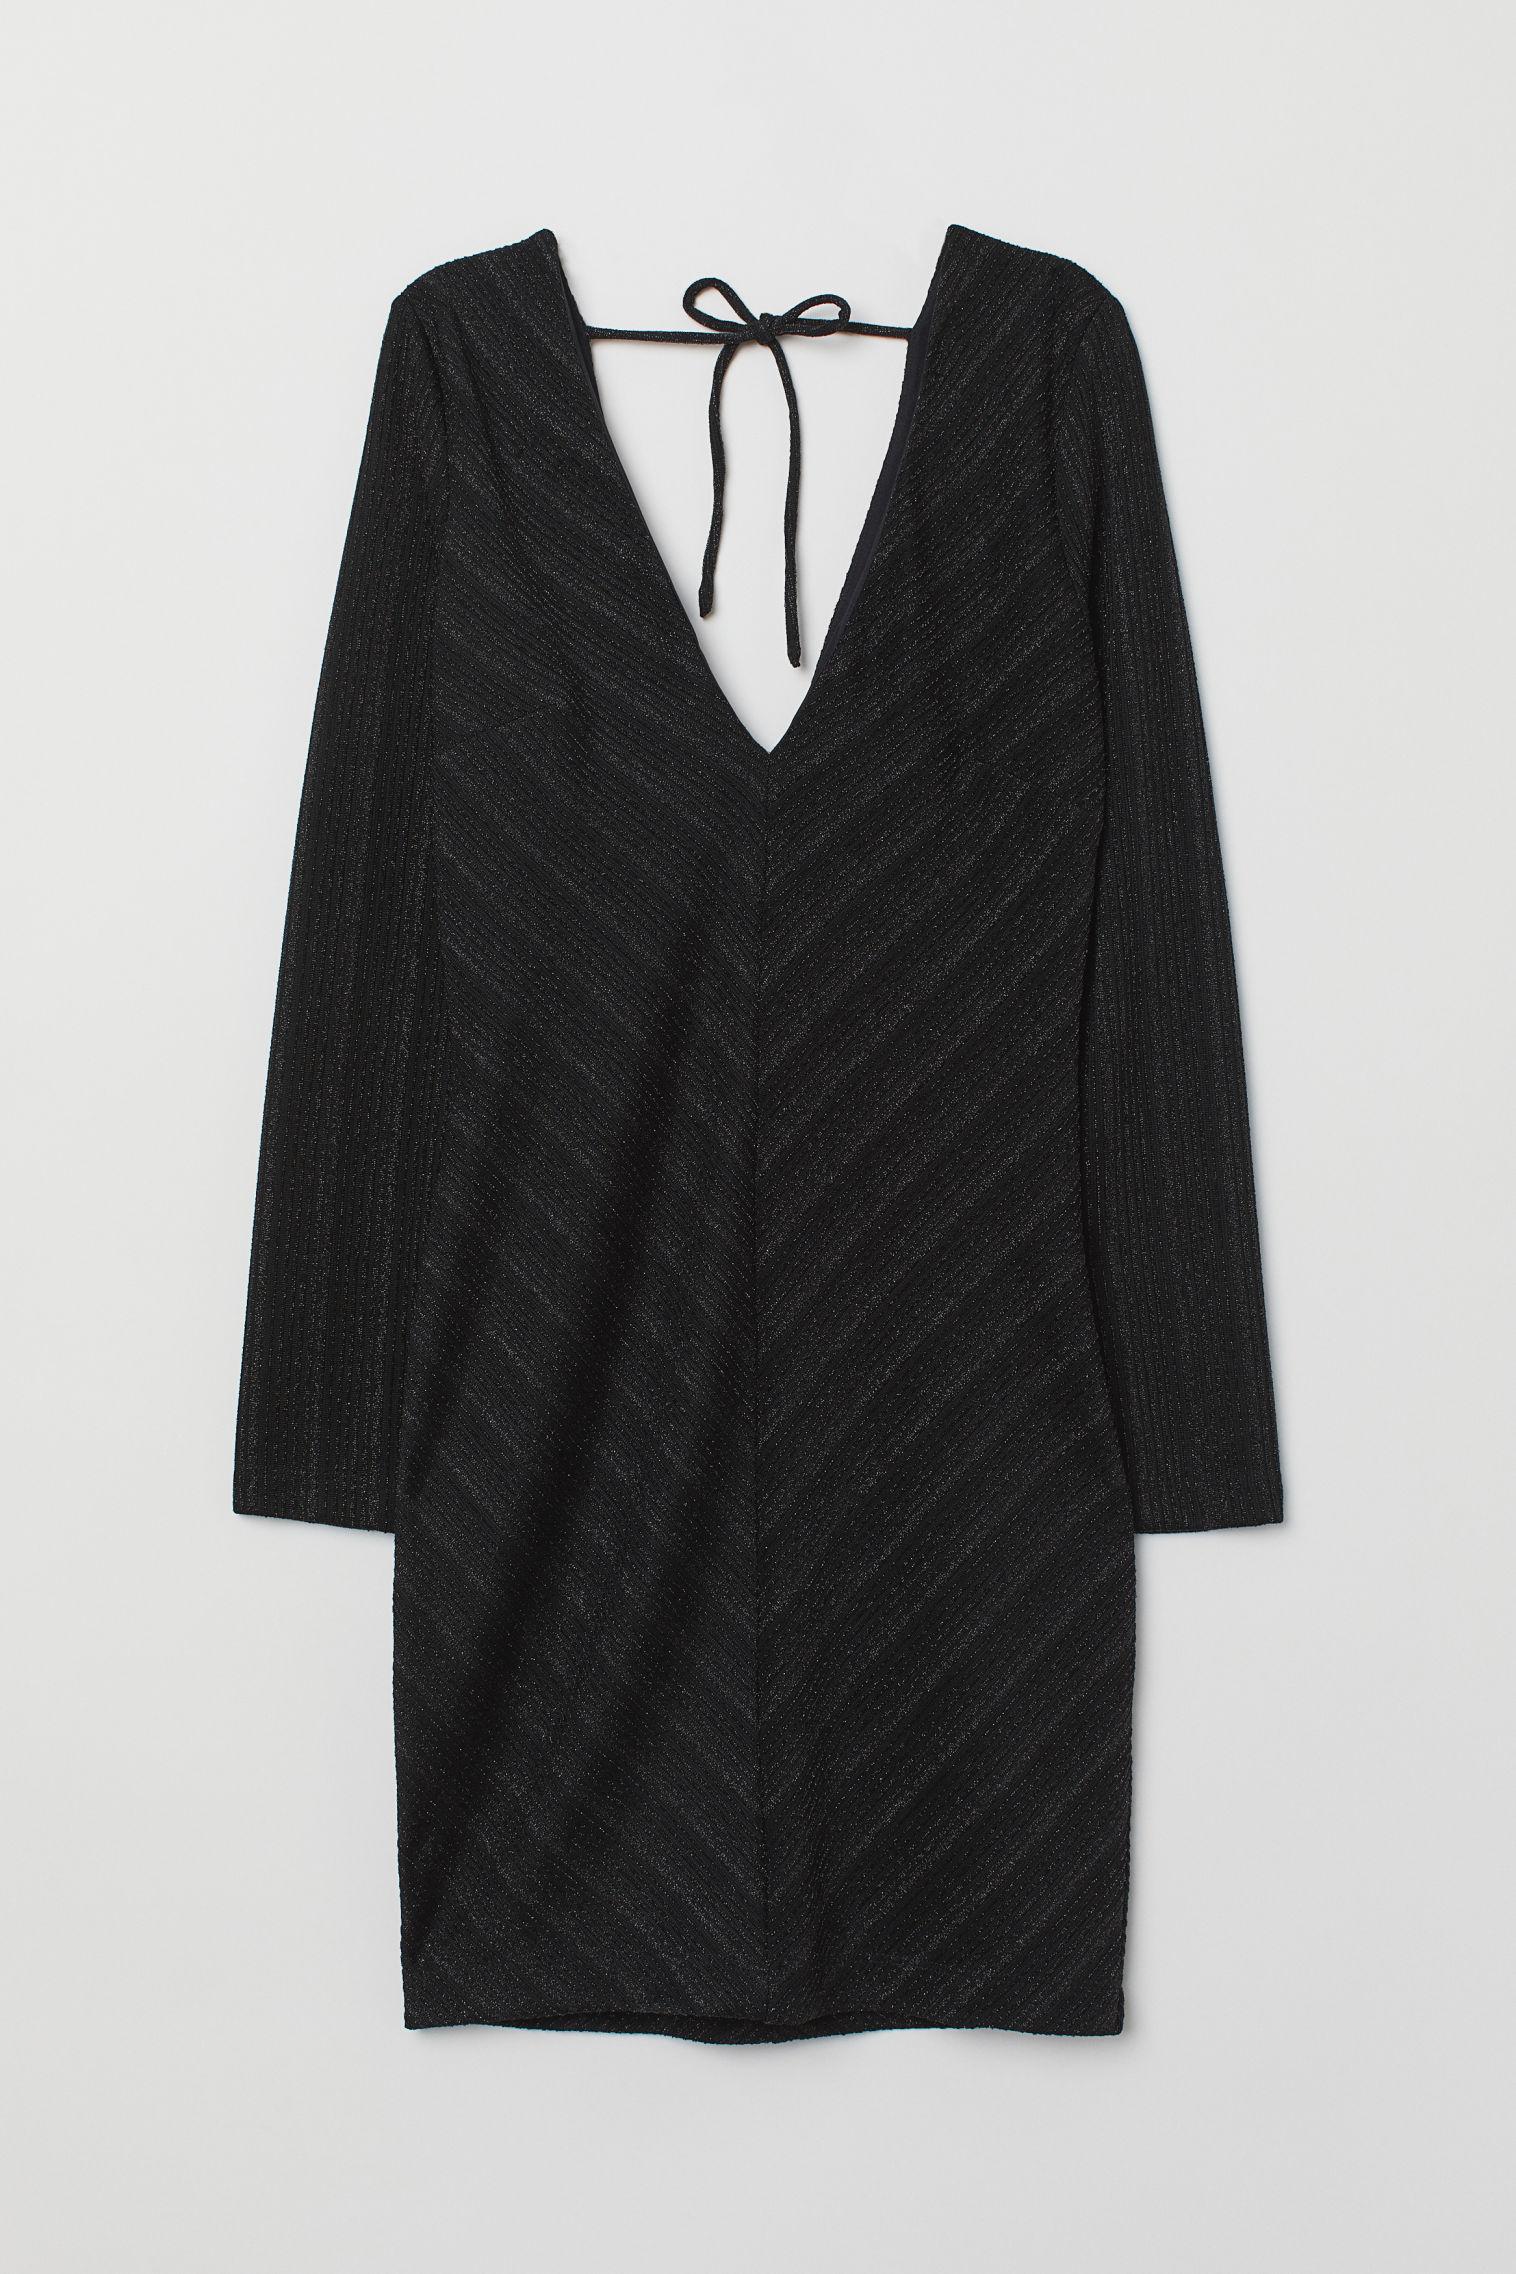 9bb3ef8ad0ca1 Bodycon dress  Bodycon dress